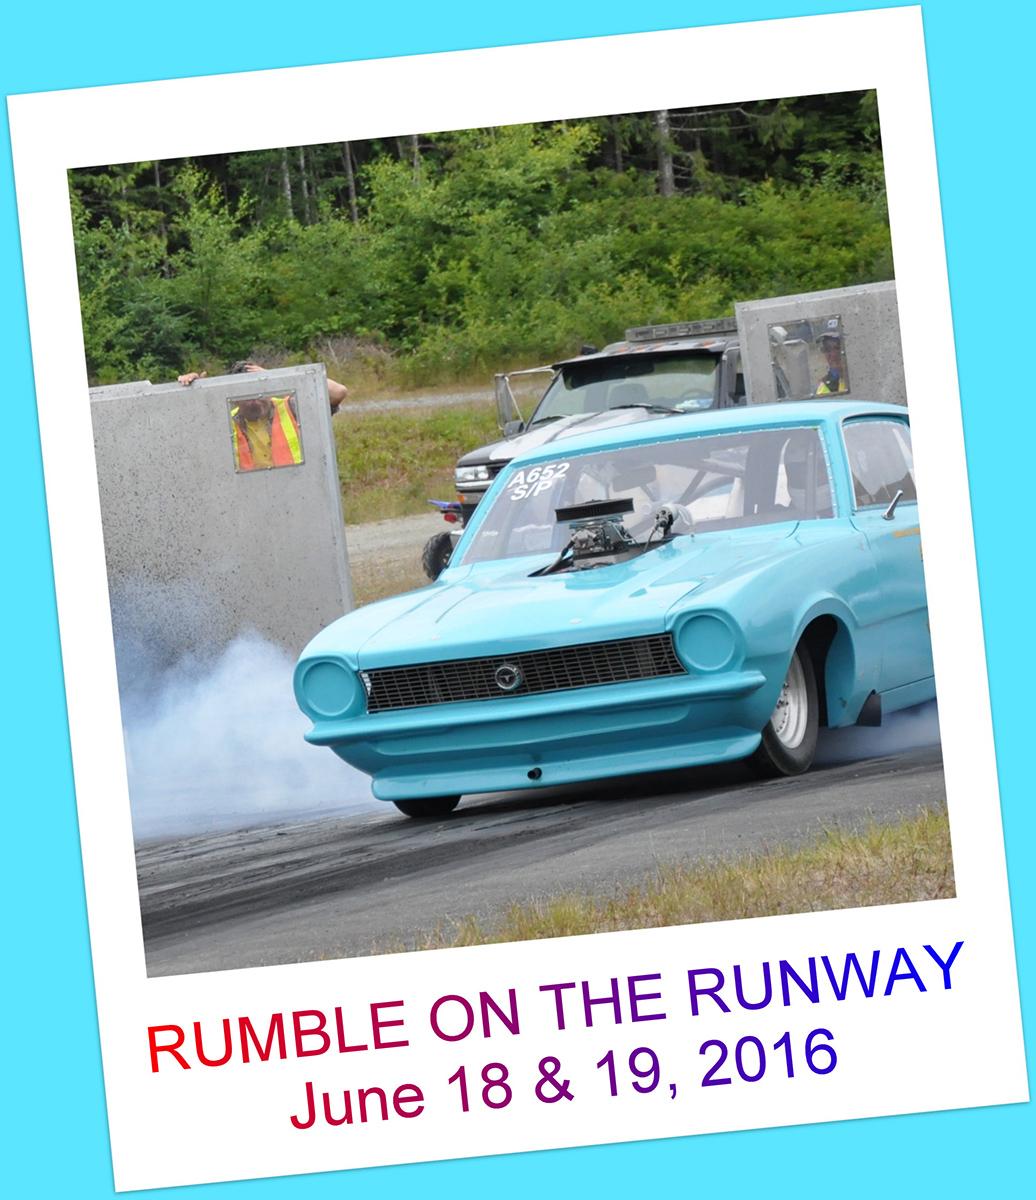 Rumble on the Runway June 18 & 19, 2016 183